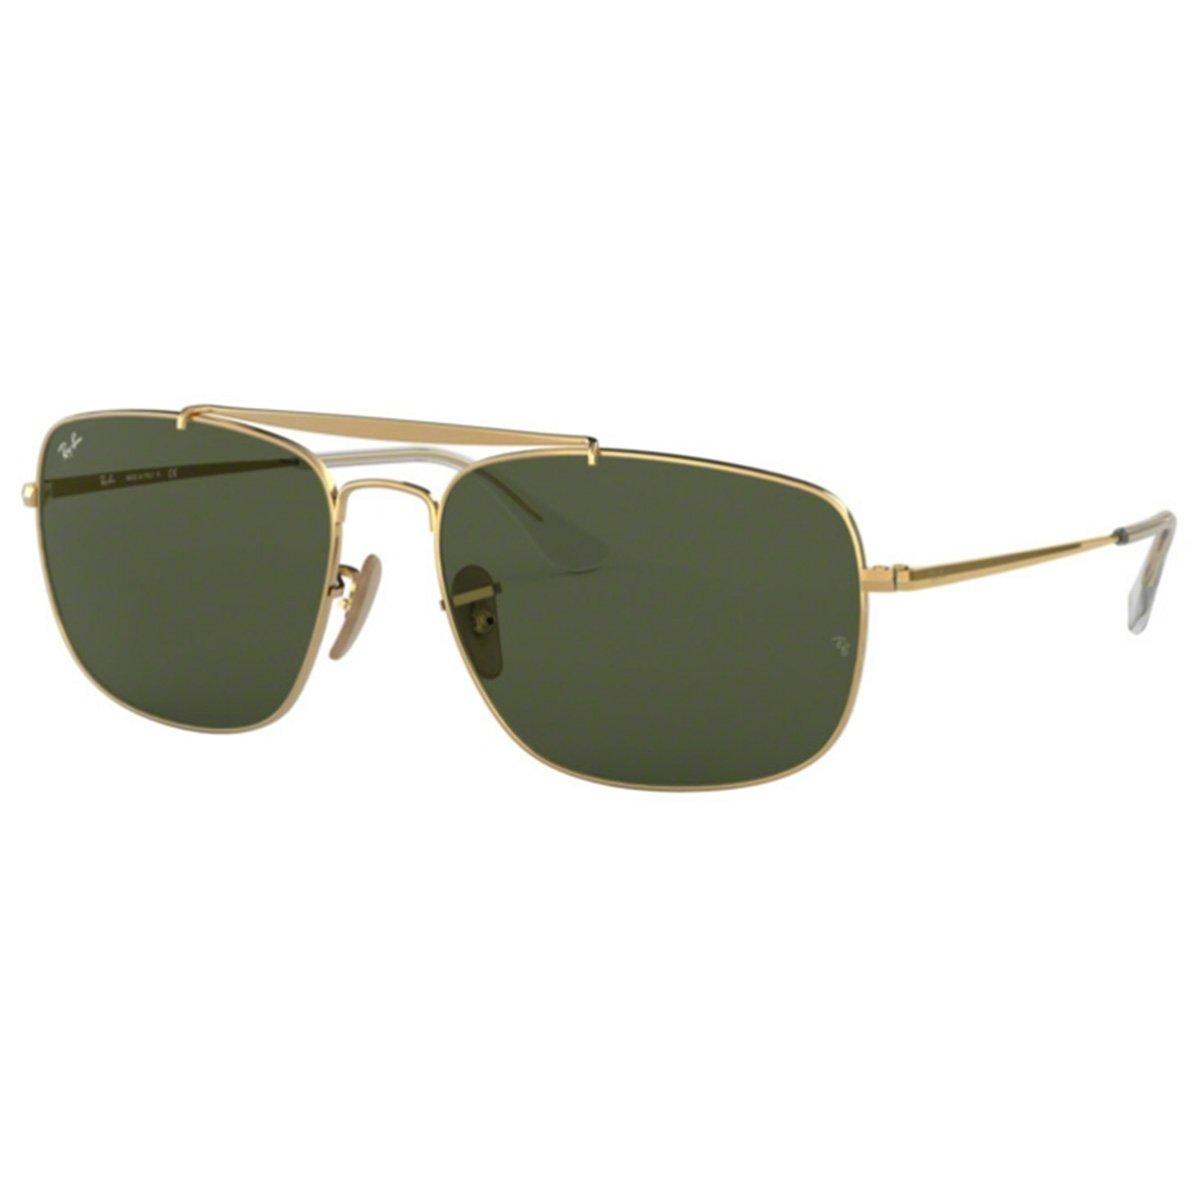 Compre Óculos de Sol Ray Ban The Colonel em 10X   Tri-Jóia Shop ee1a975676